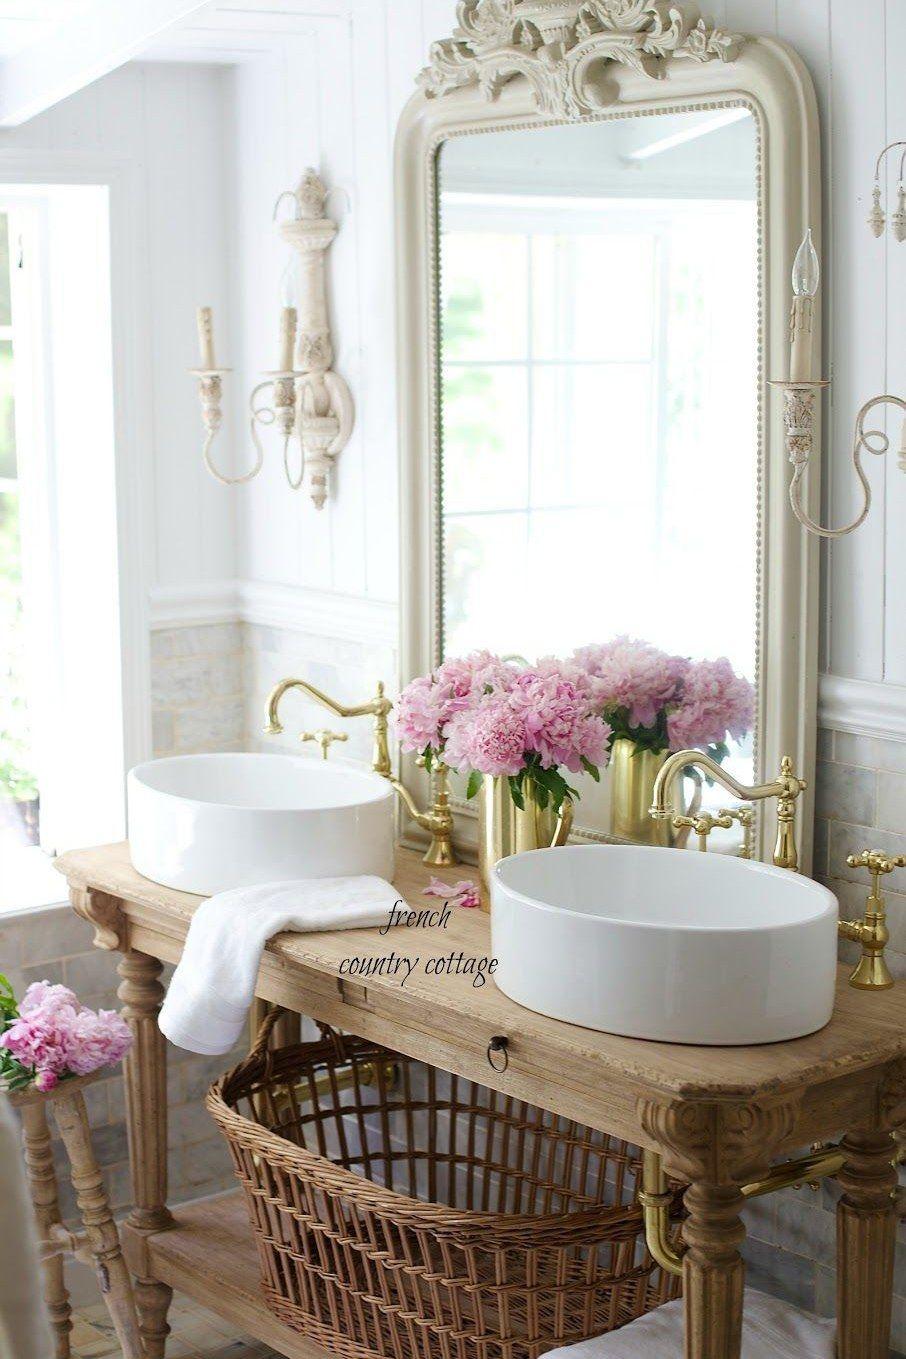 Bathroom Decor. Make a splash in your bathroom design by introducing ...